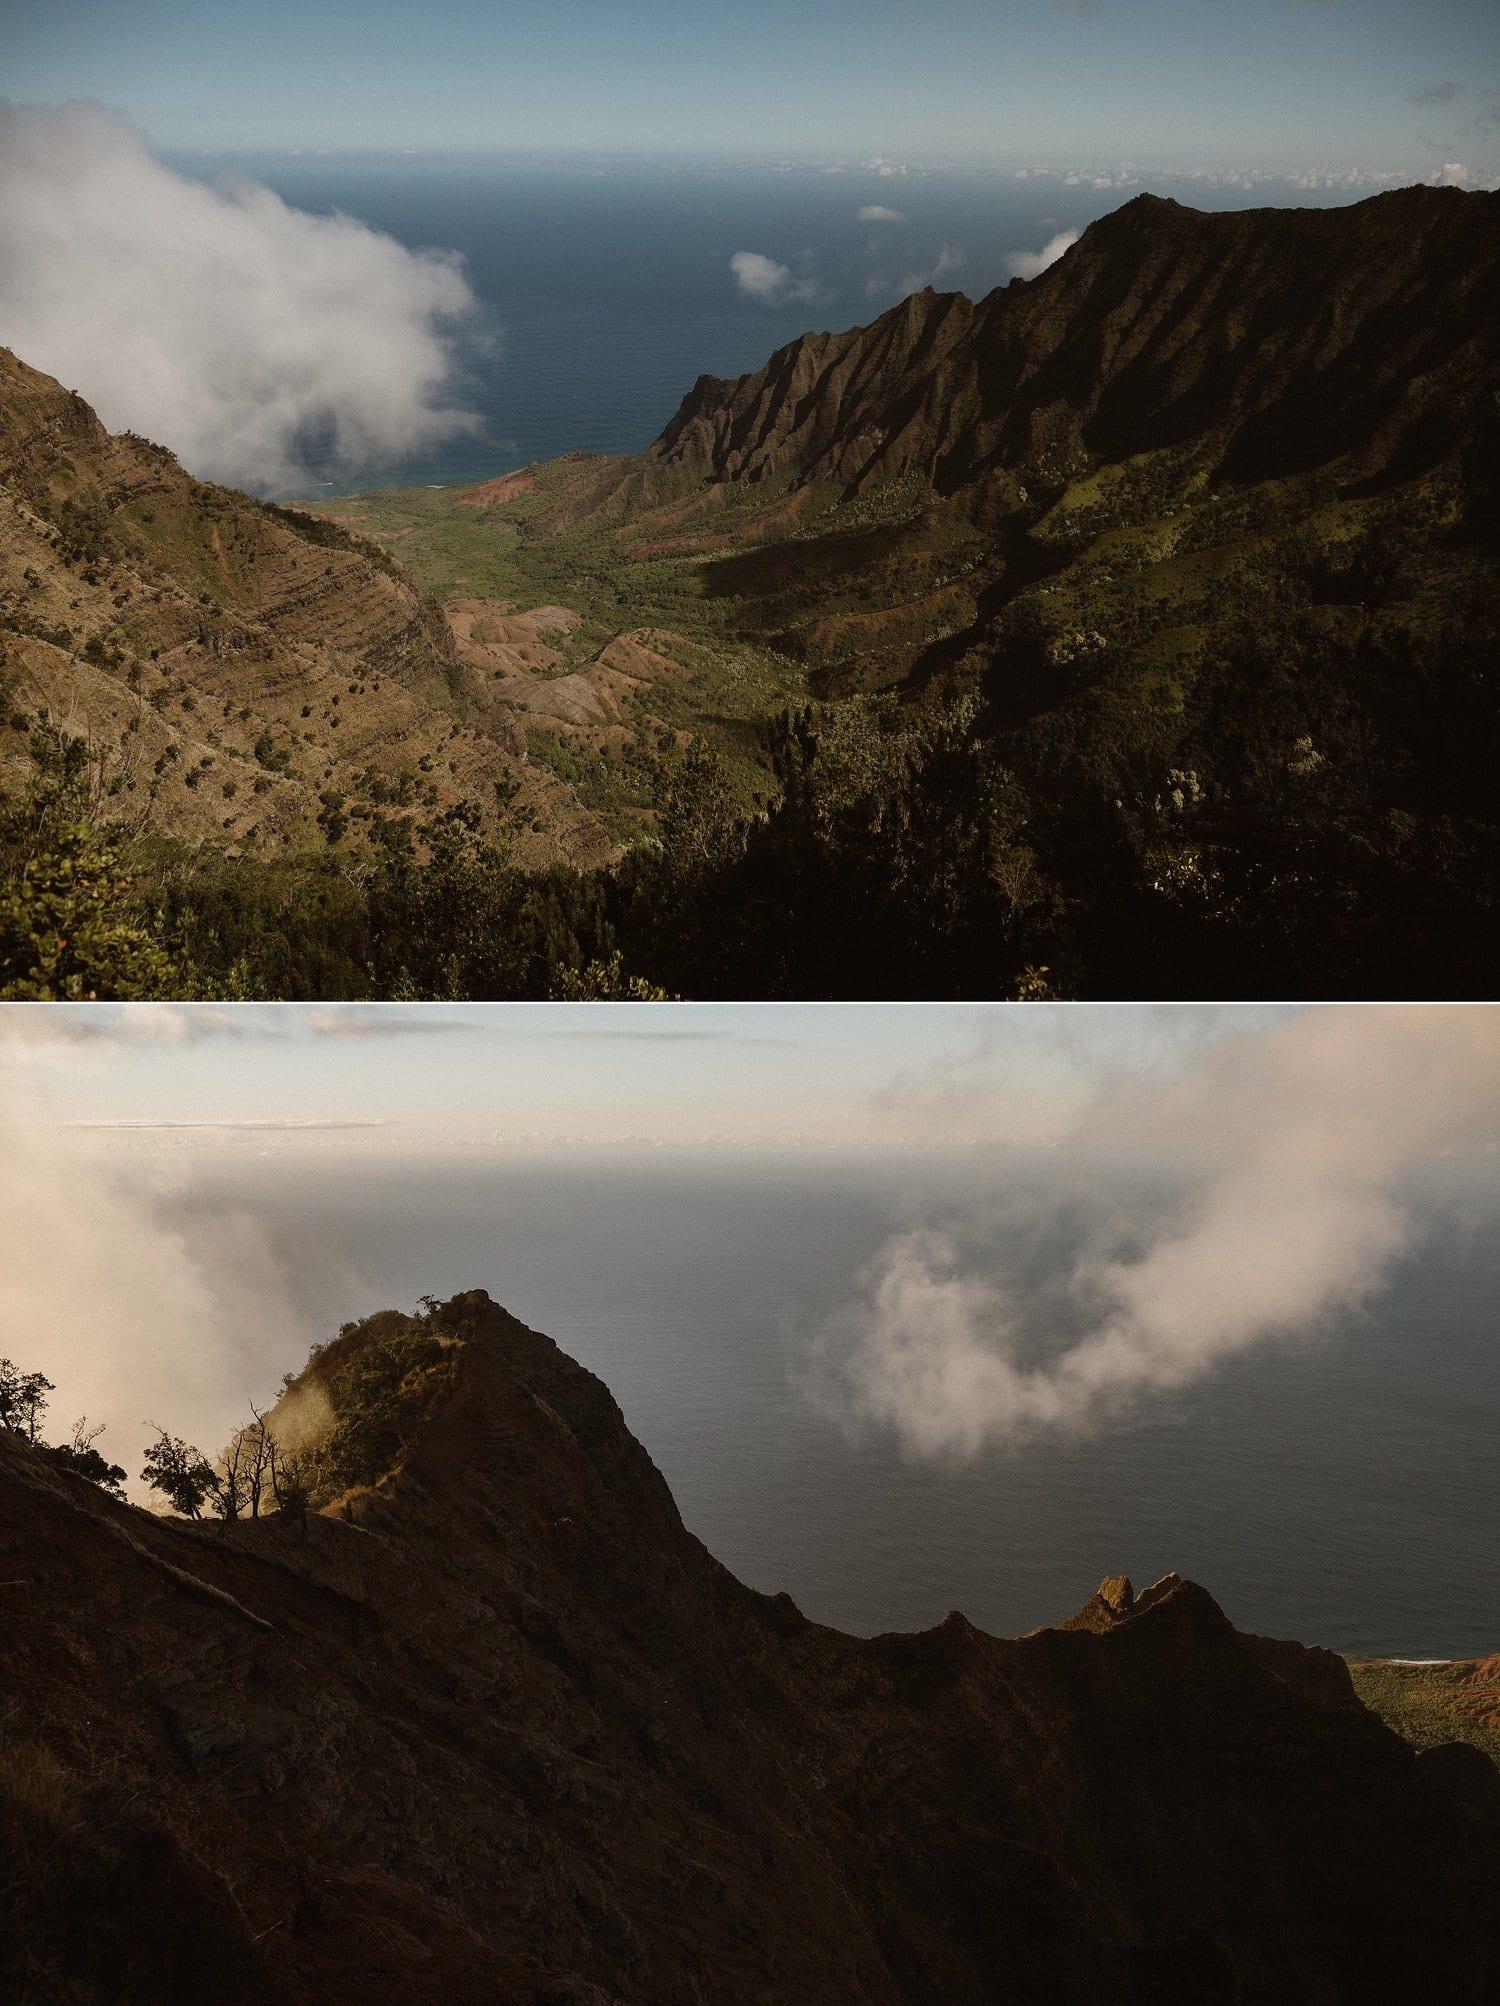 Landscape photo of Hawaii.